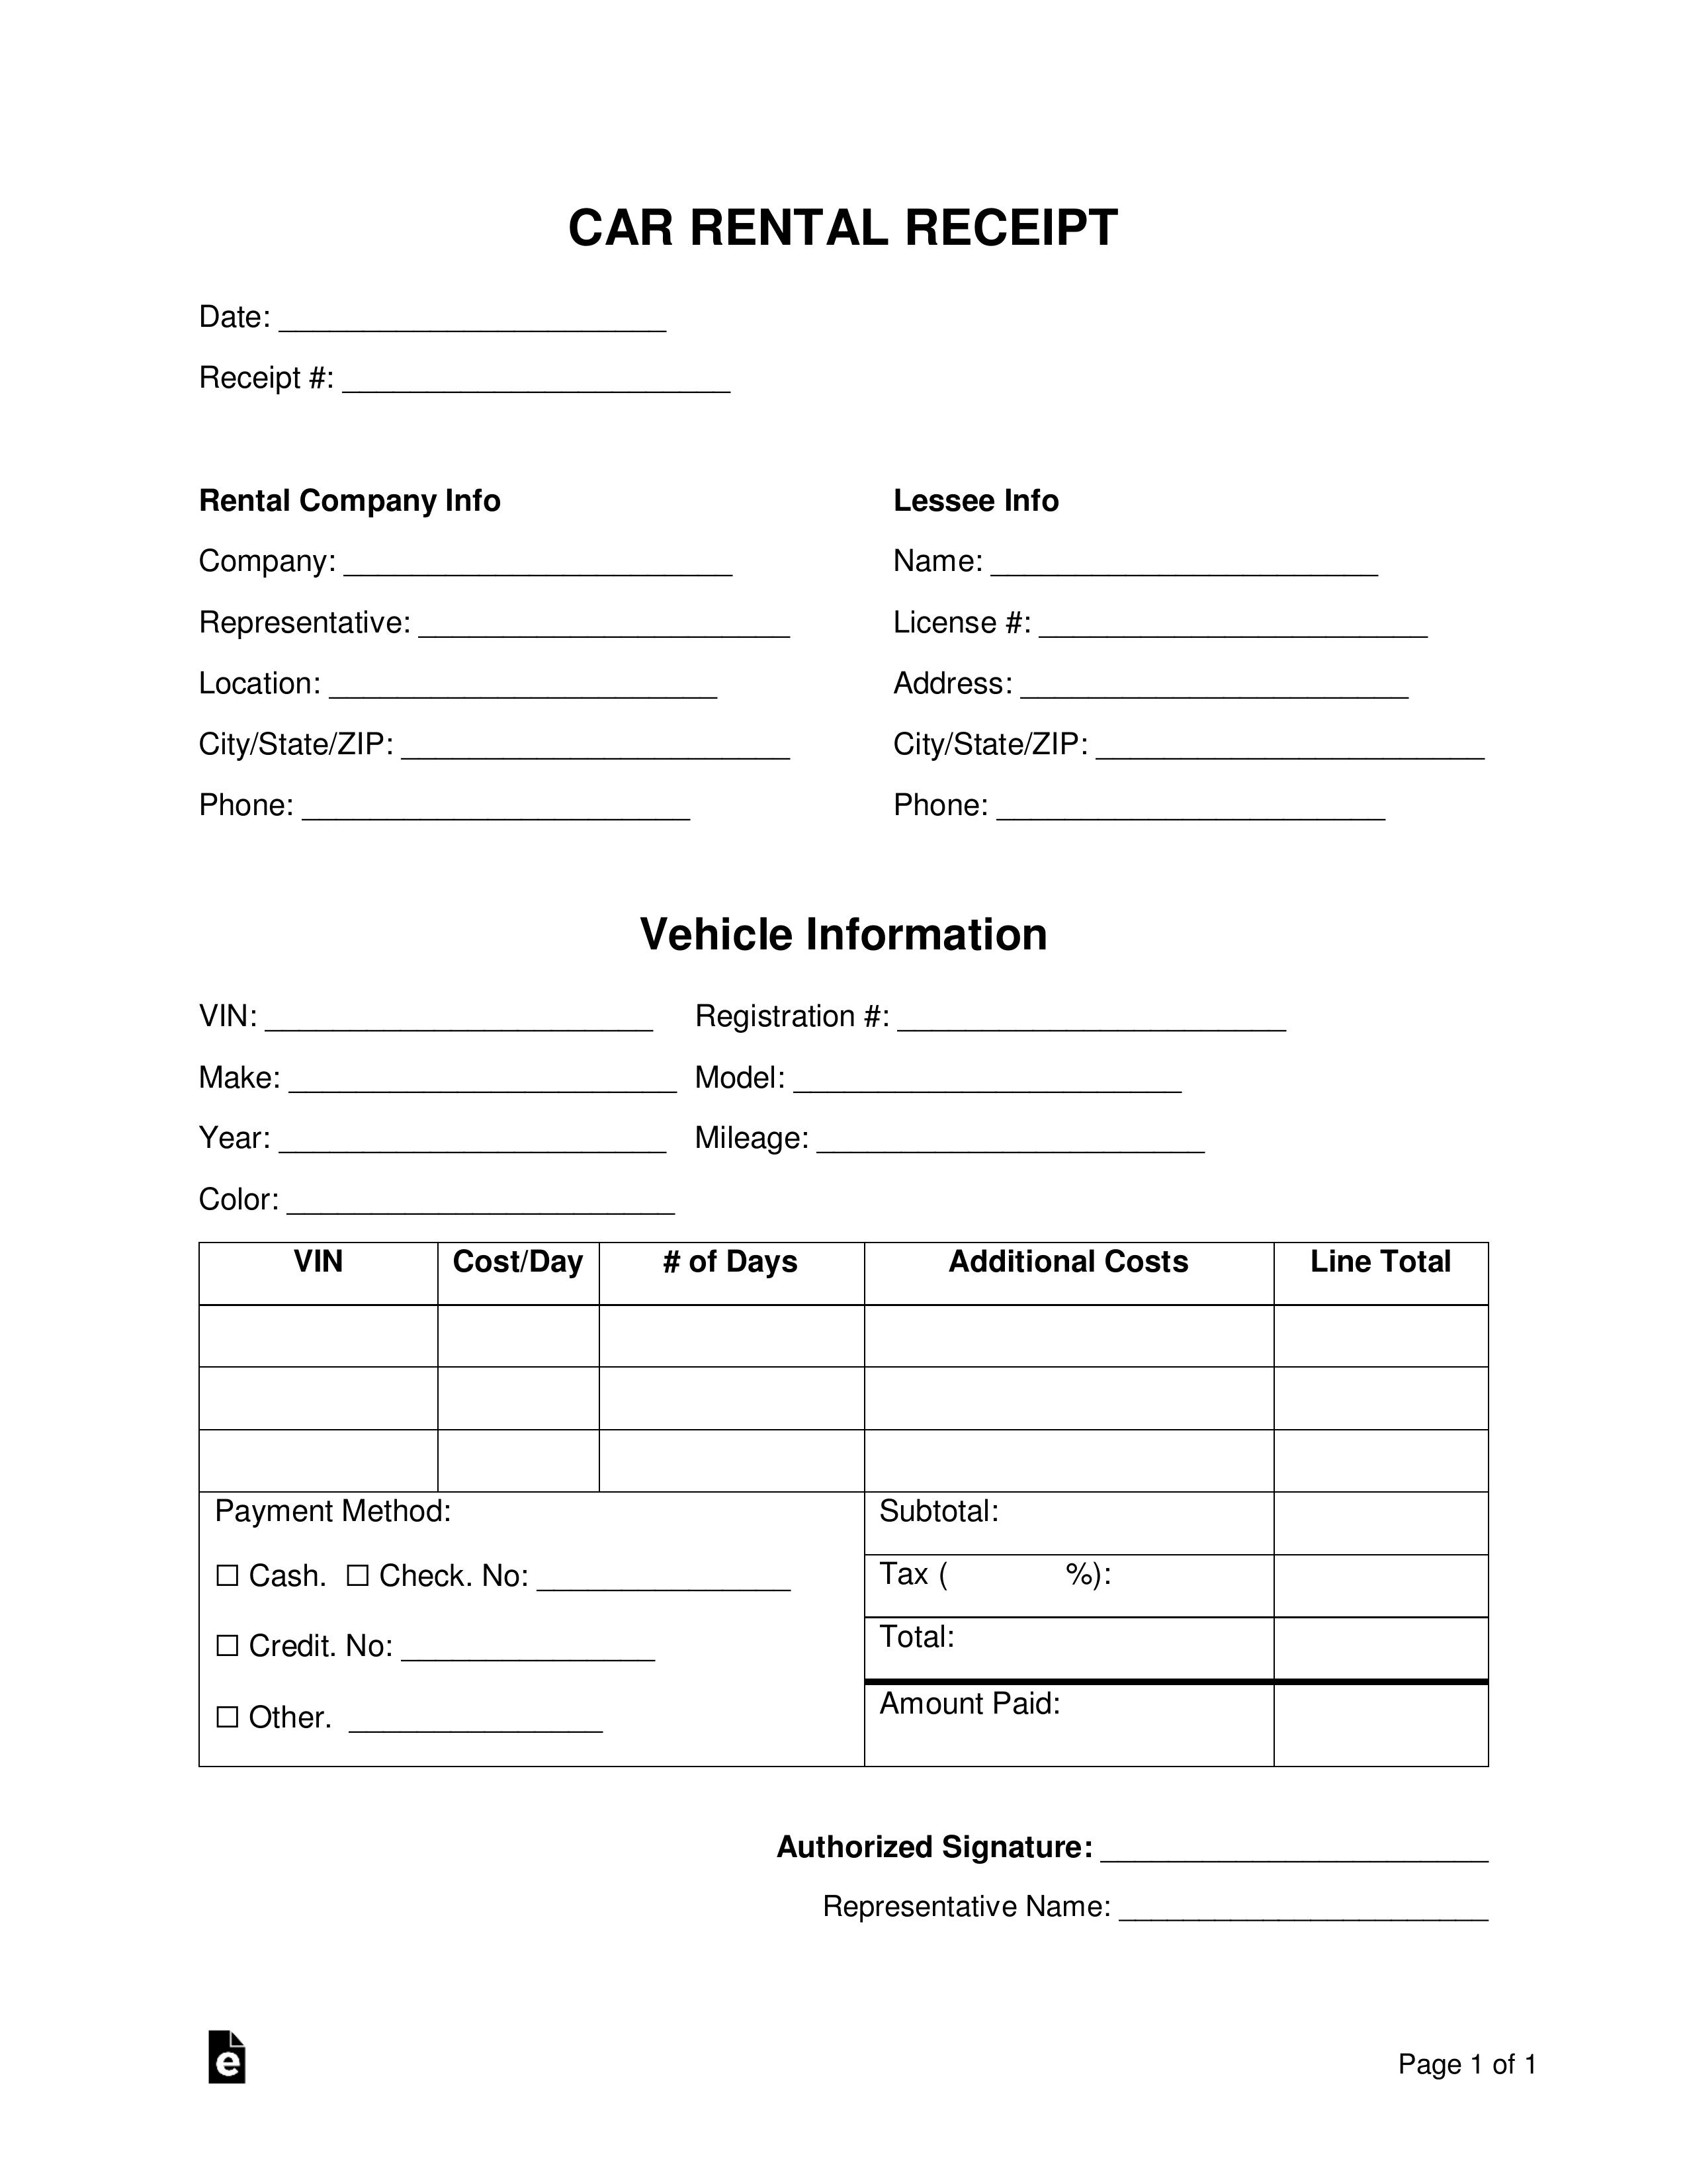 free car rental receipt template word pdf eforms car hire receipt details